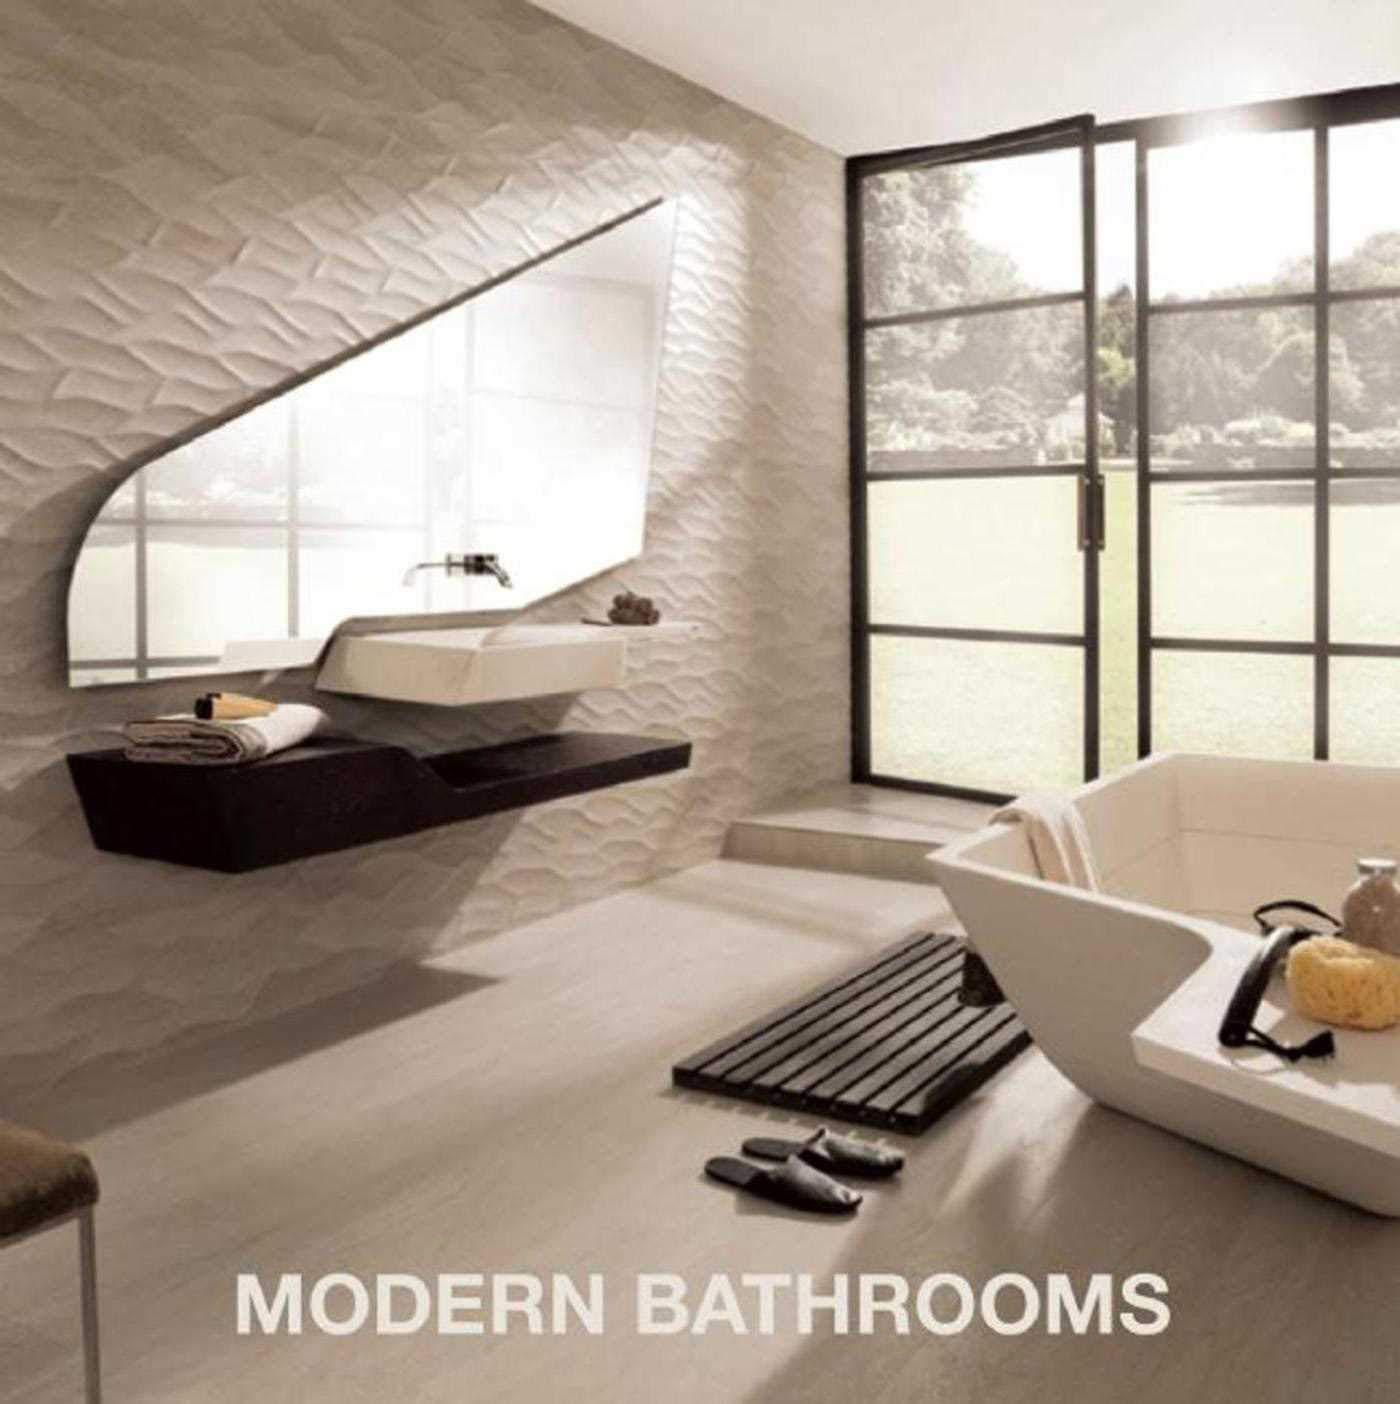 Modern Bathrooms Publications Loft 9781510704510 Amazon Com Books